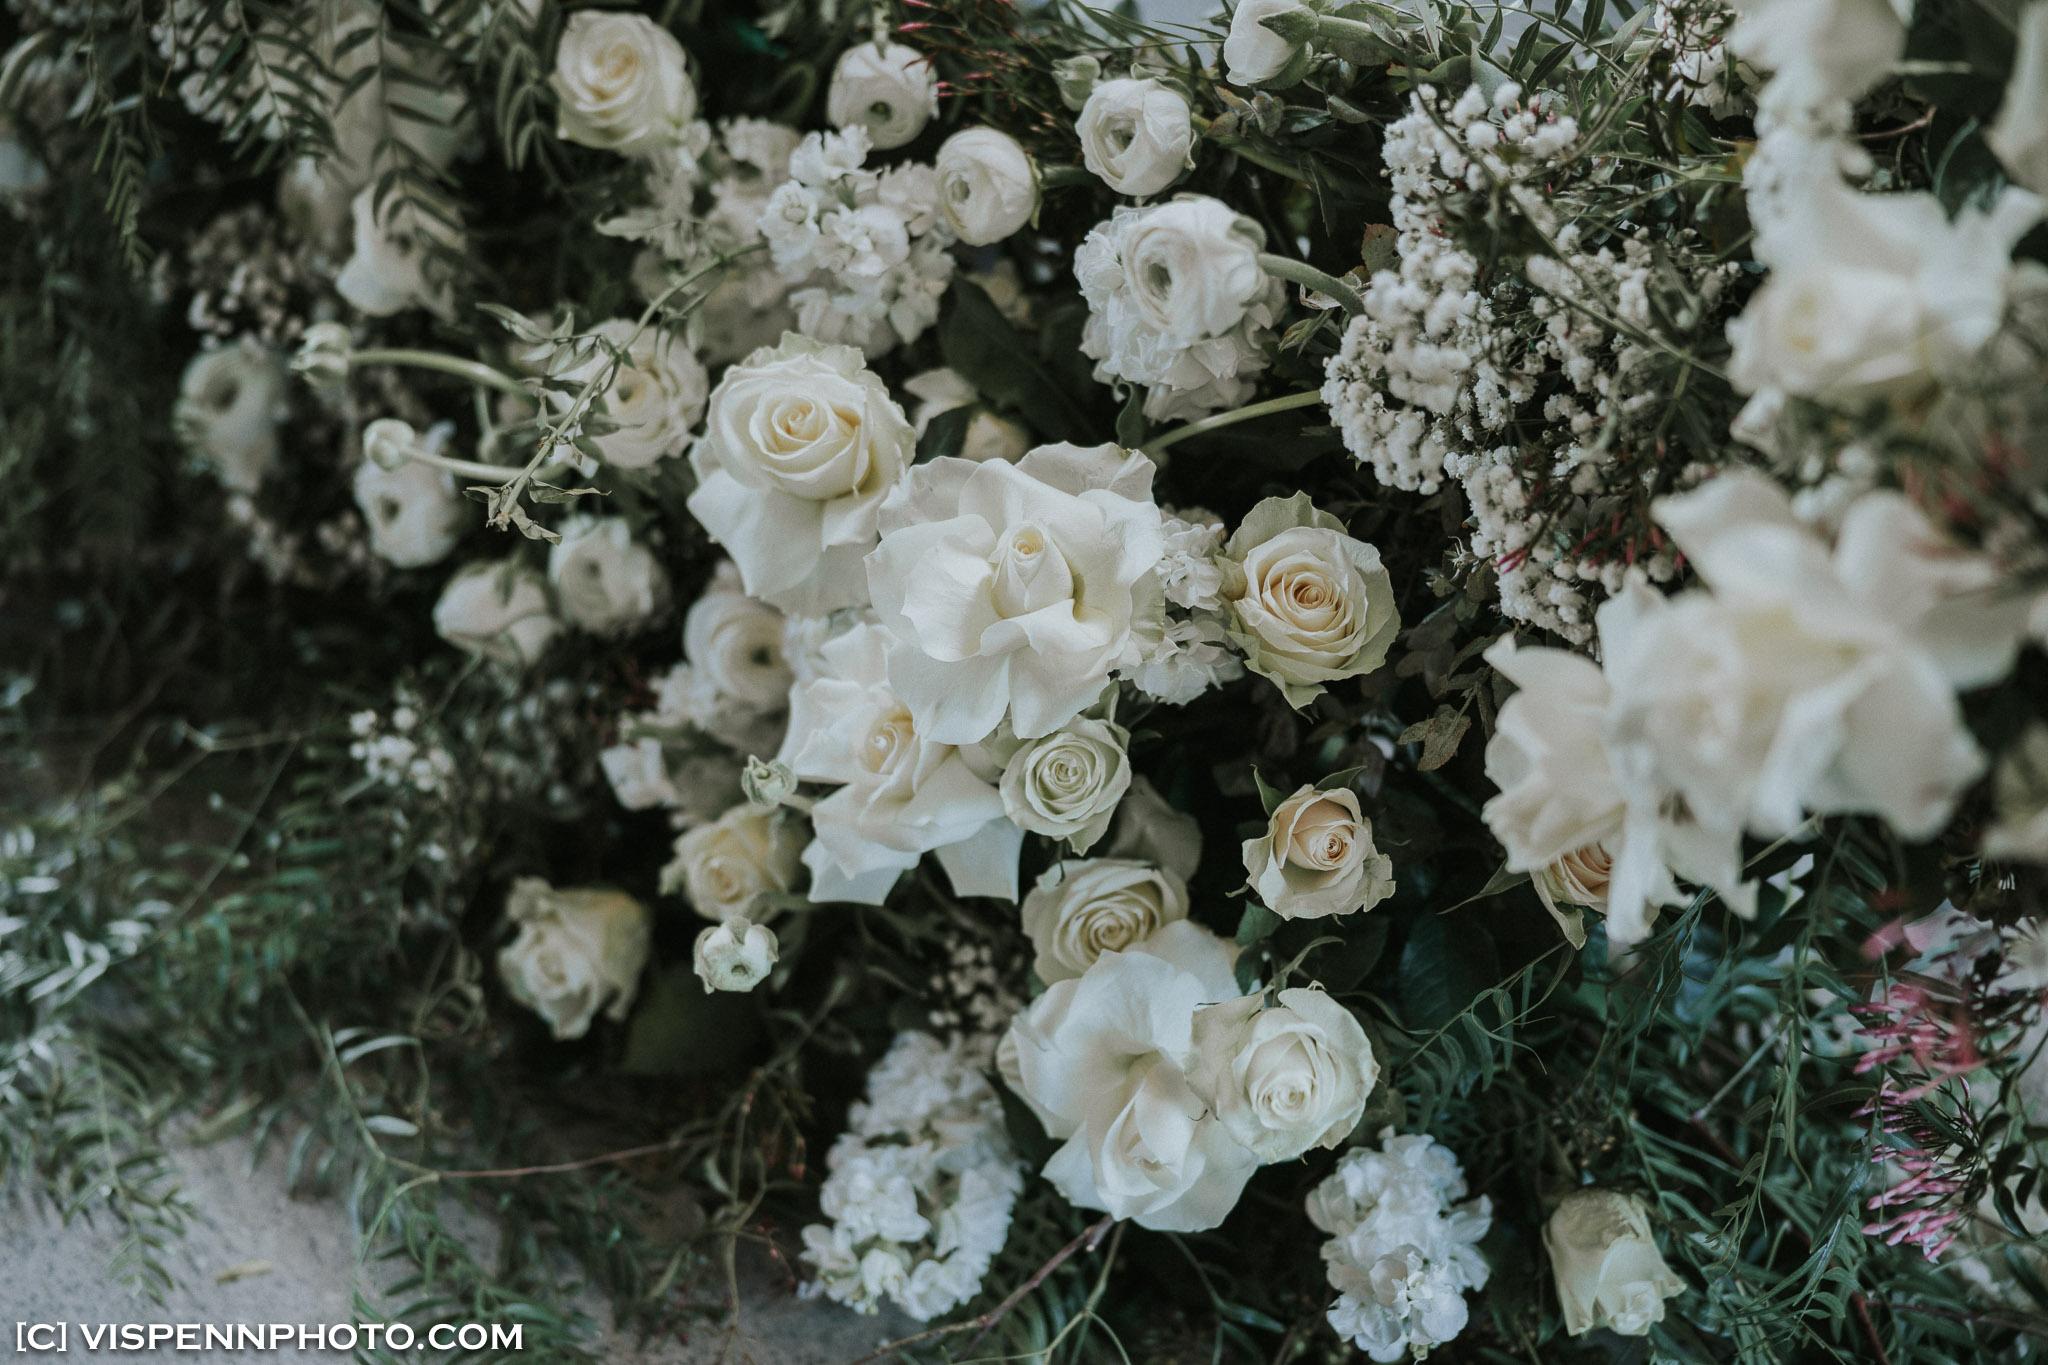 WEDDING DAY Photography Melbourne VISPENN 墨尔本 婚礼跟拍 婚礼摄像 婚礼摄影 结婚照 登记照 LeanneWesley 02758 1P EOSR VISPENN